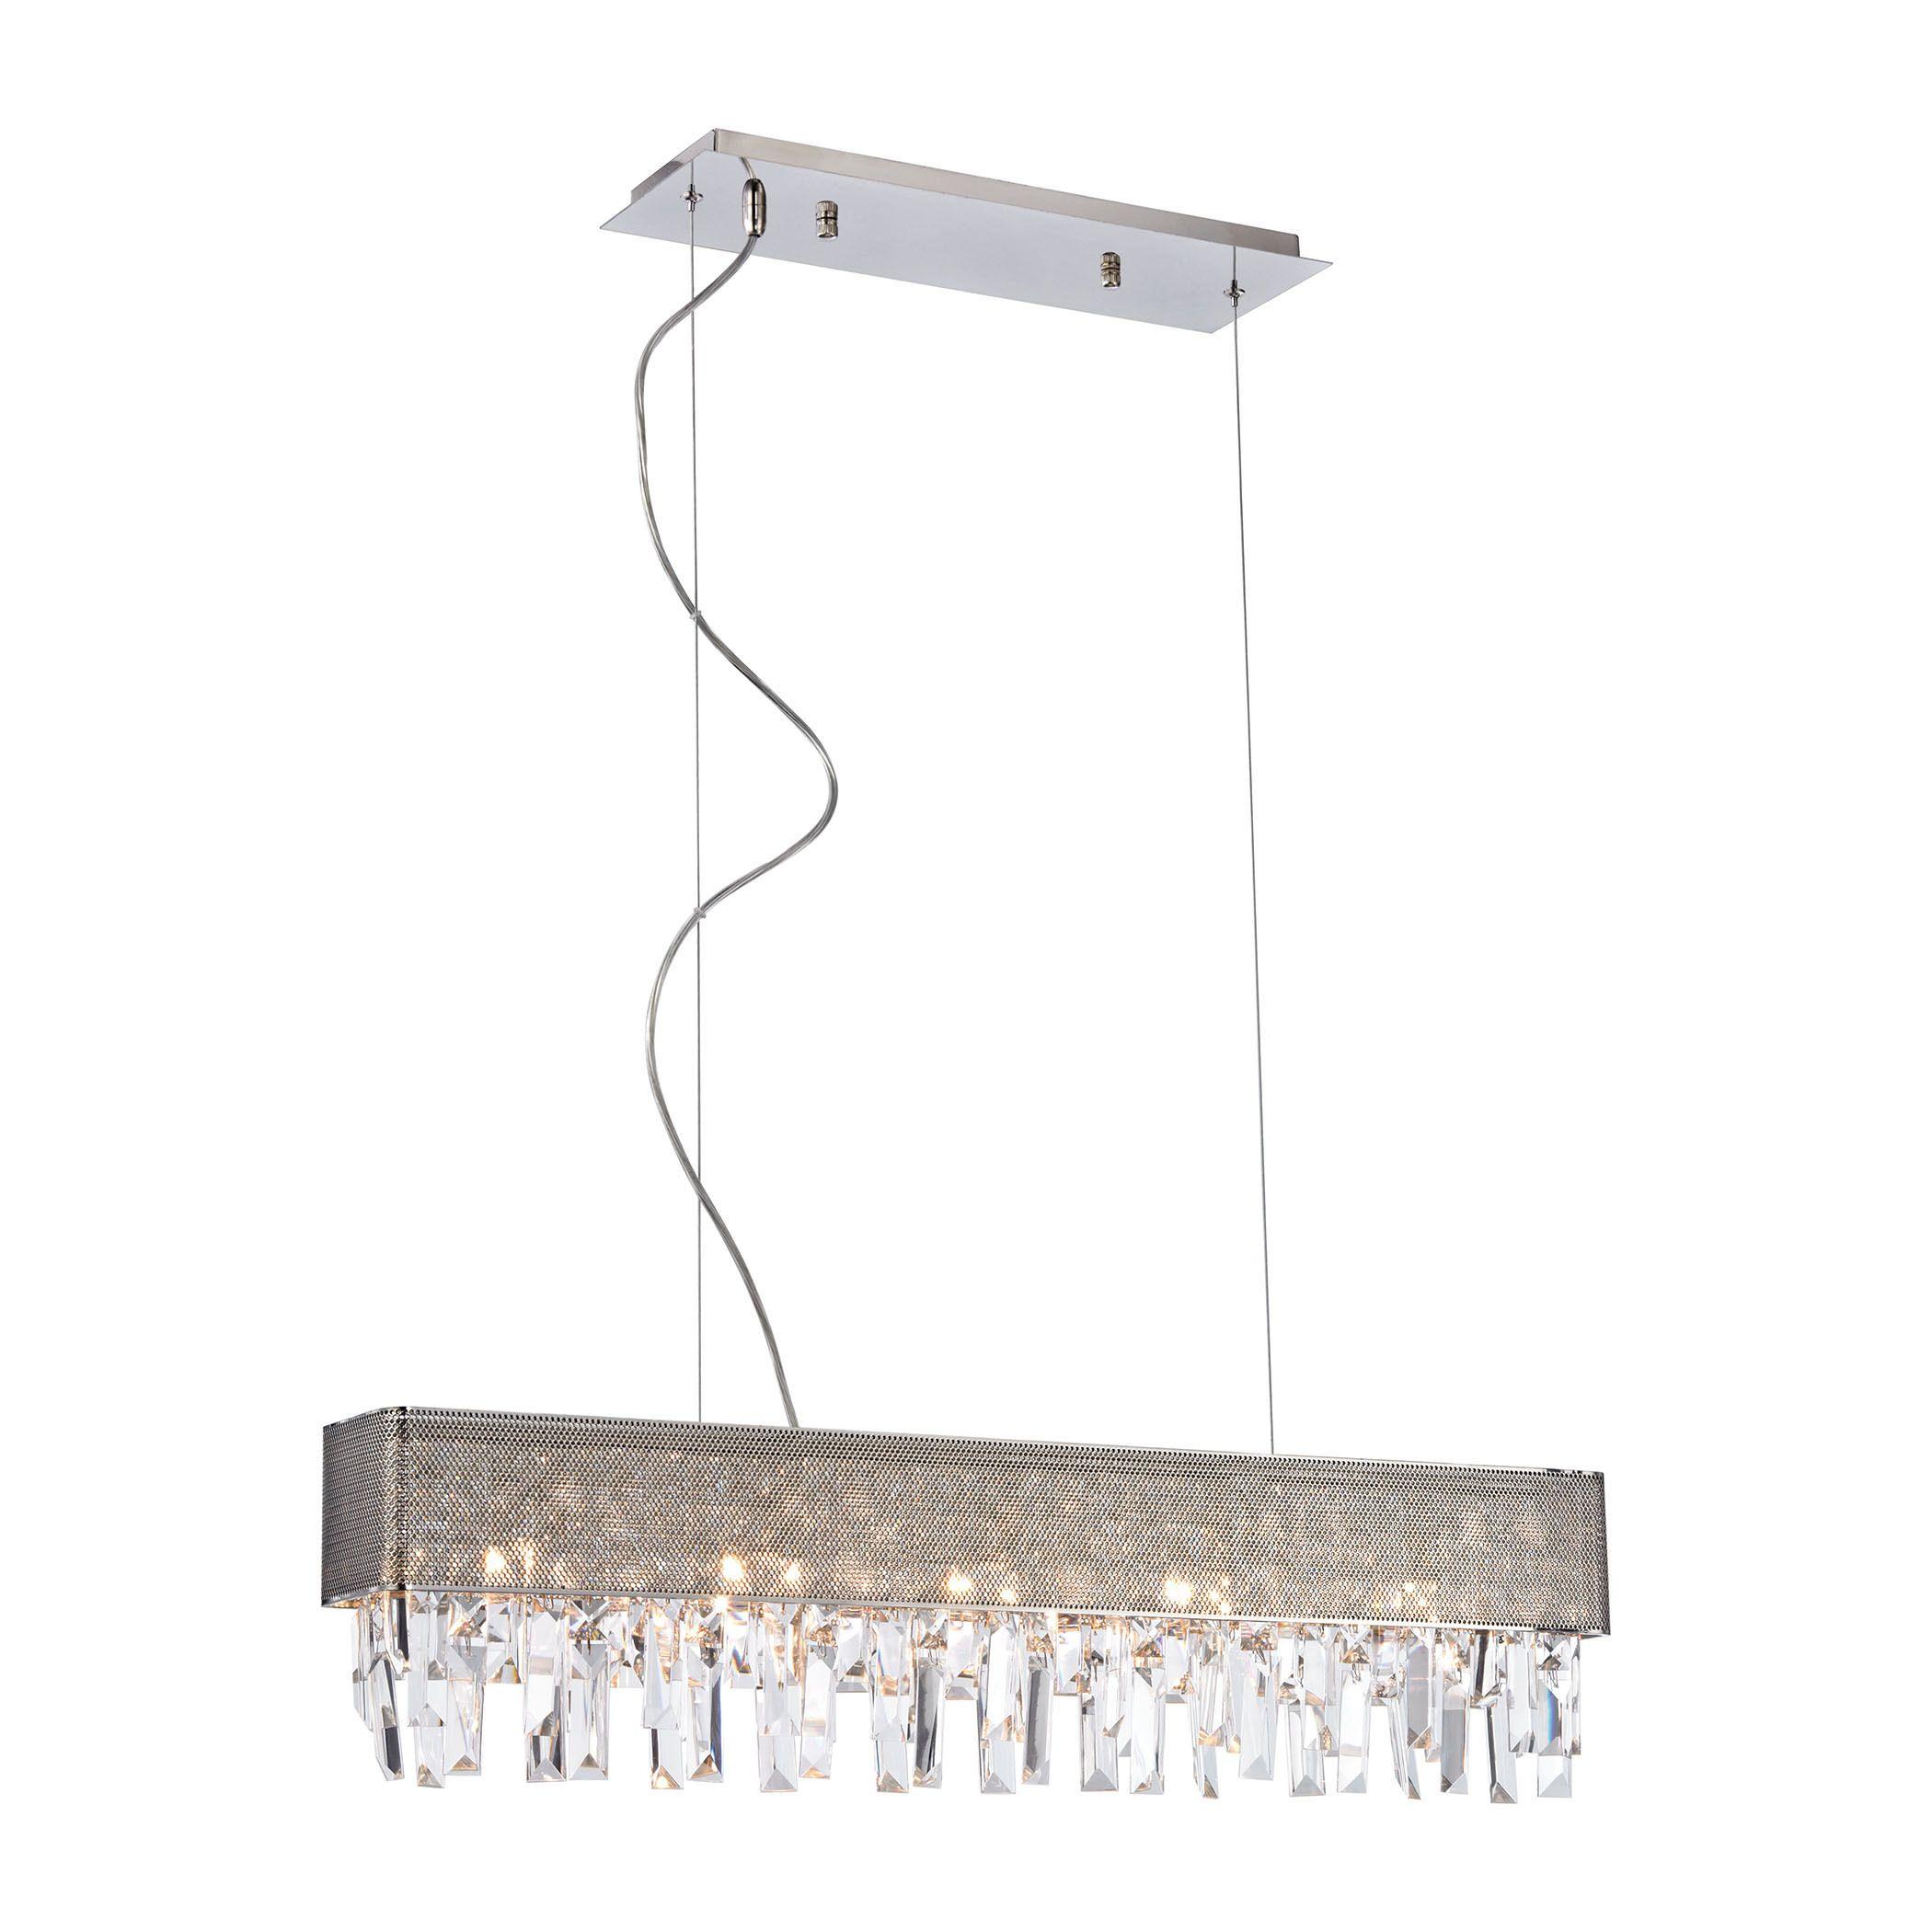 Elk valance 5 light led chandelier in polished products elk valance 5 light led chandelier in polished arubaitofo Image collections